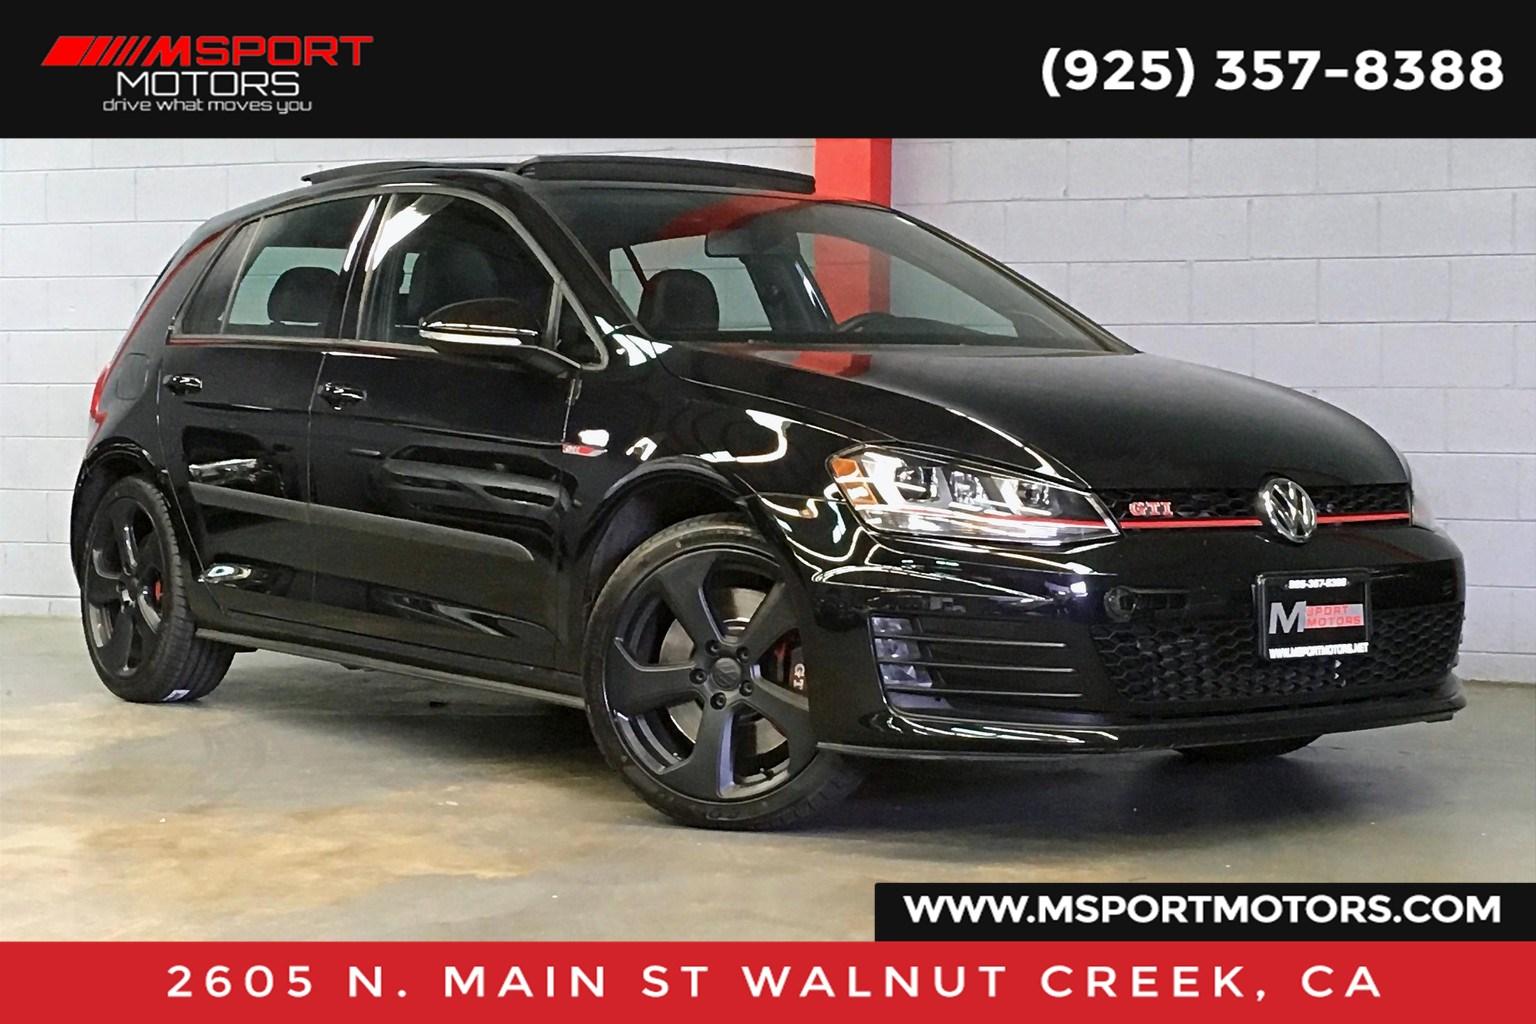 2017 Volkswagen Golf GTI SE - M Sport Motors